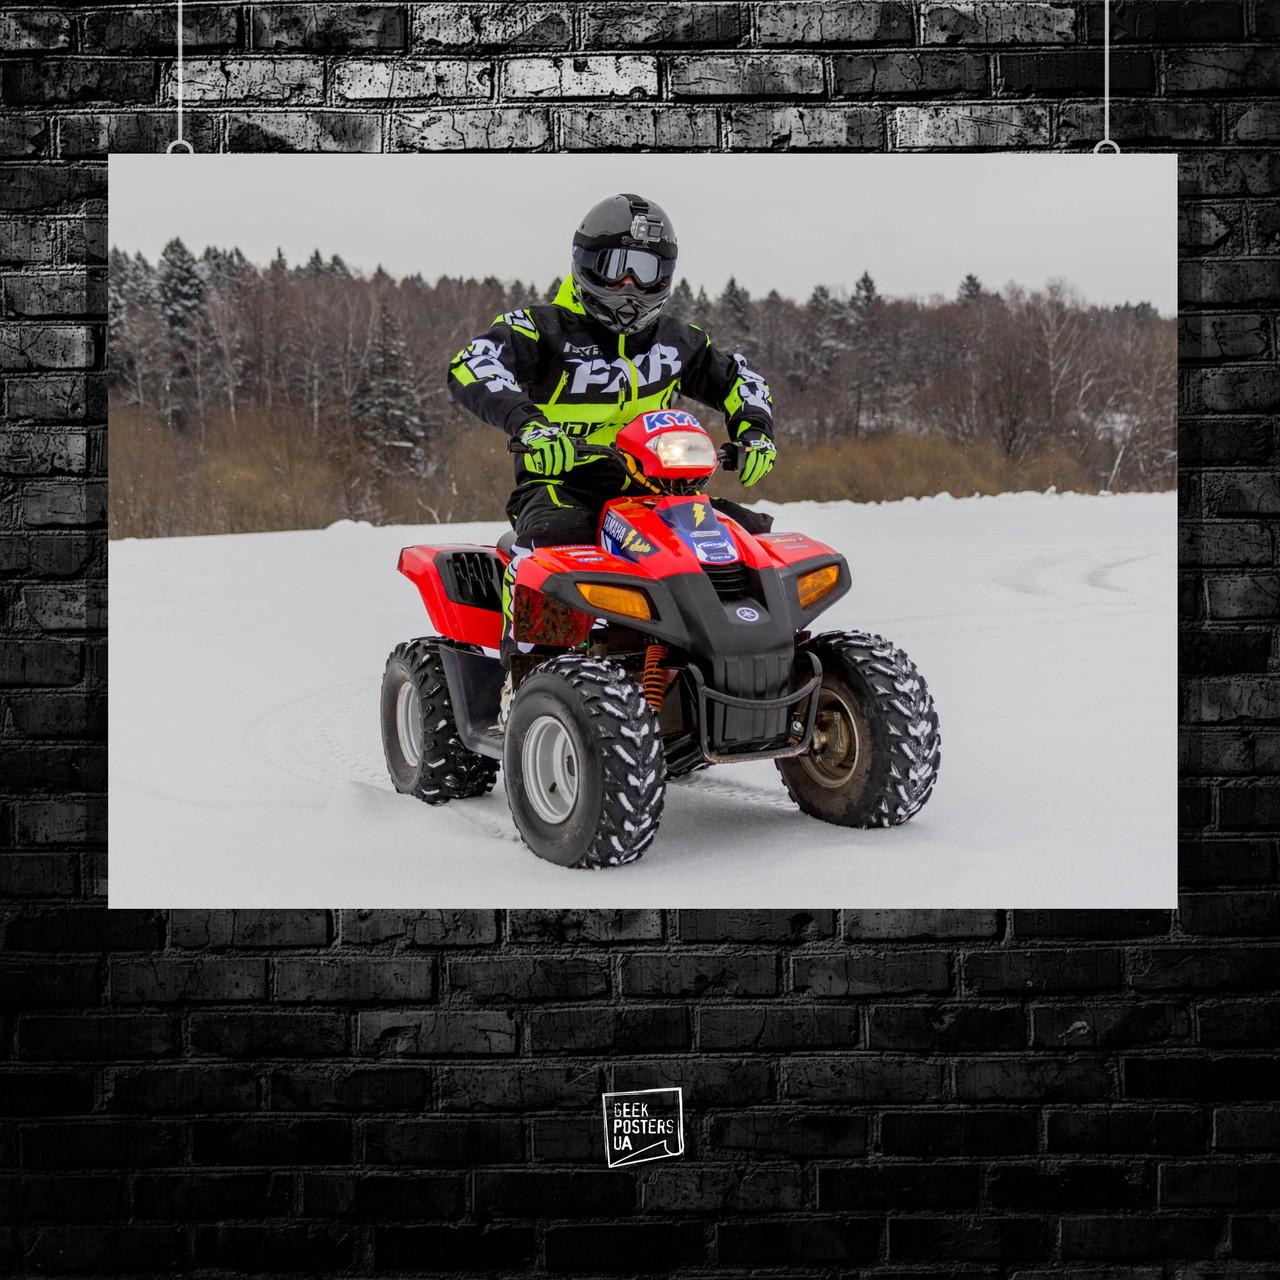 Постер Квадроцикл, четырёхколёсный мотовездеход, мотовездеход, мотокросс, суперкросс, эндуро, quad bike. Размер 60x42см (A2). Глянцевая бумага